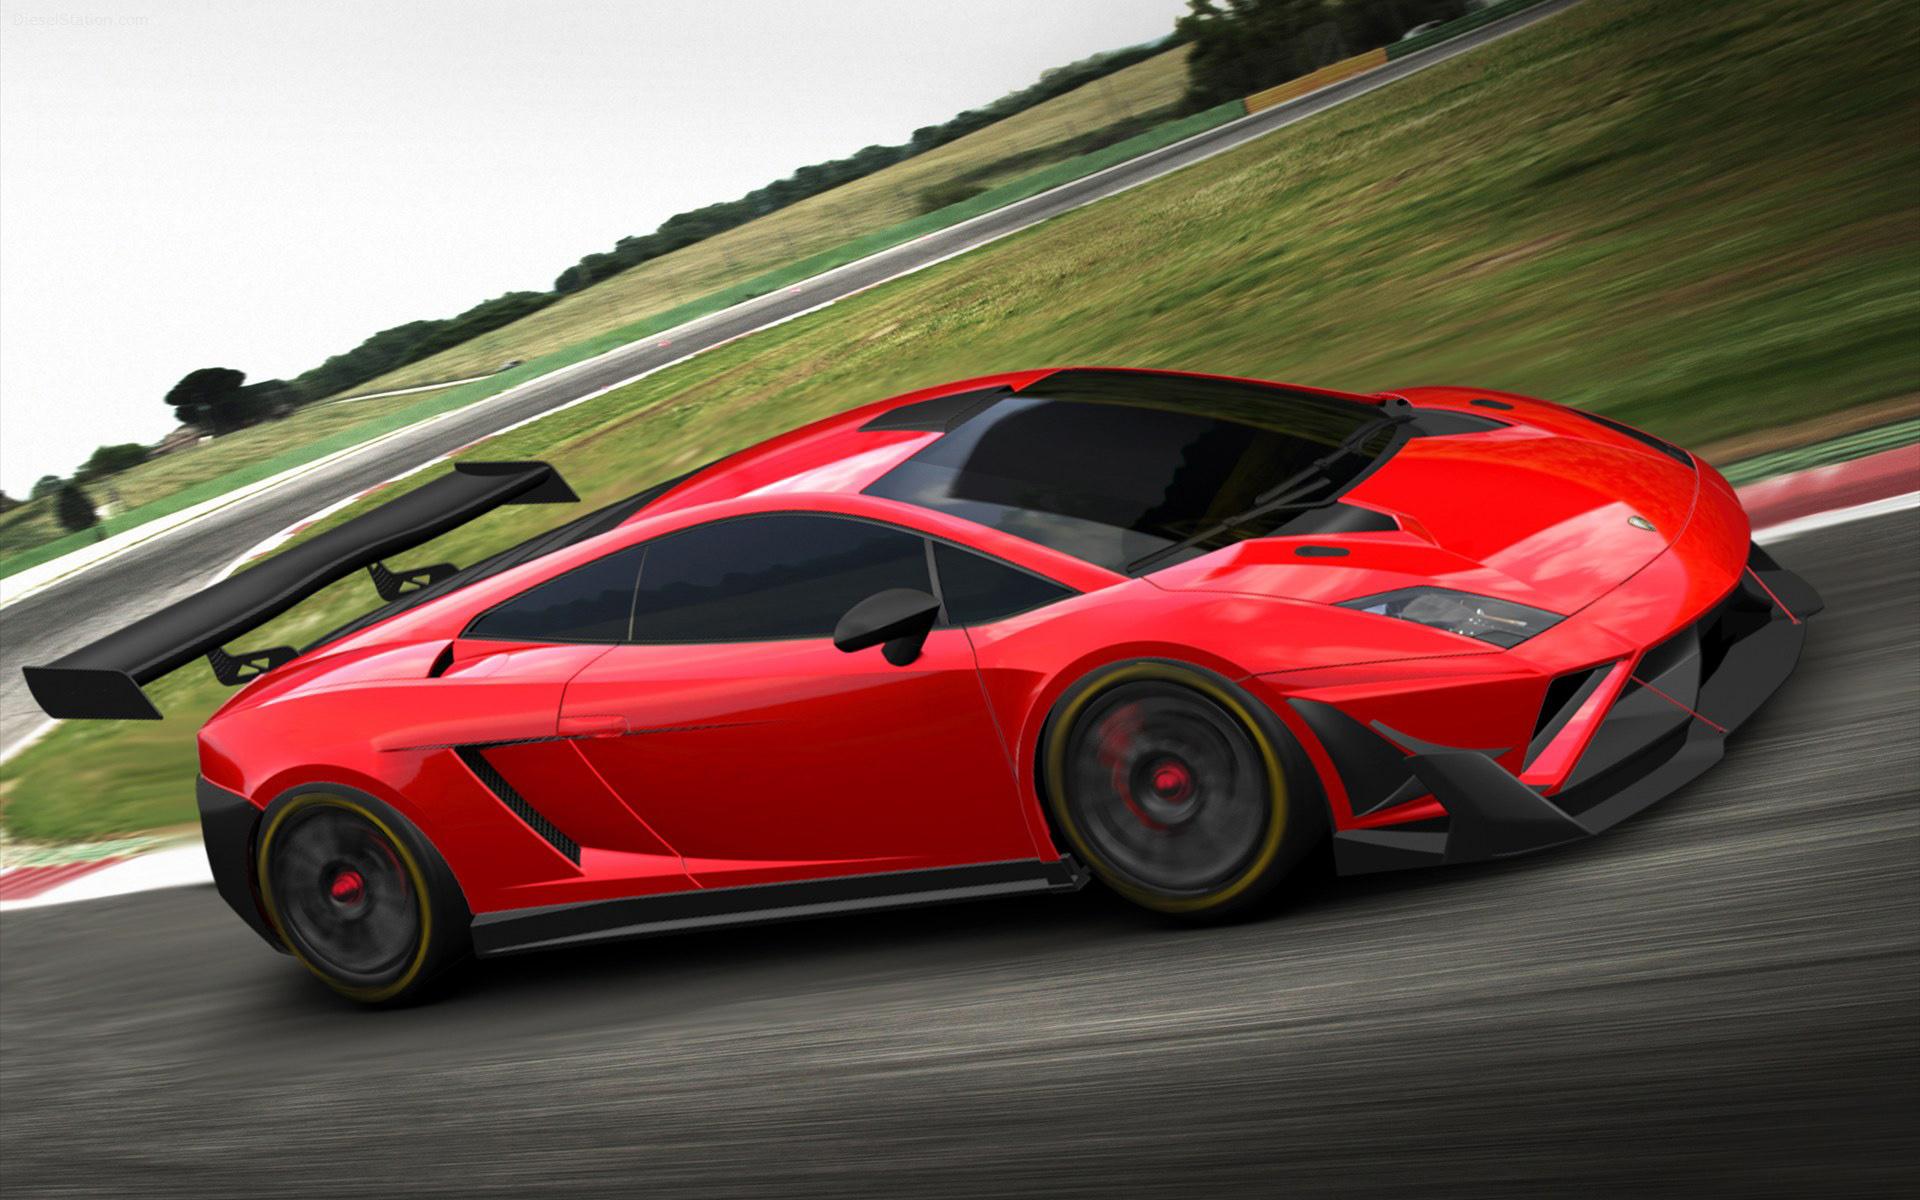 2014 Lamborghini Gallardo #5 Lamborghini Gallardo #5